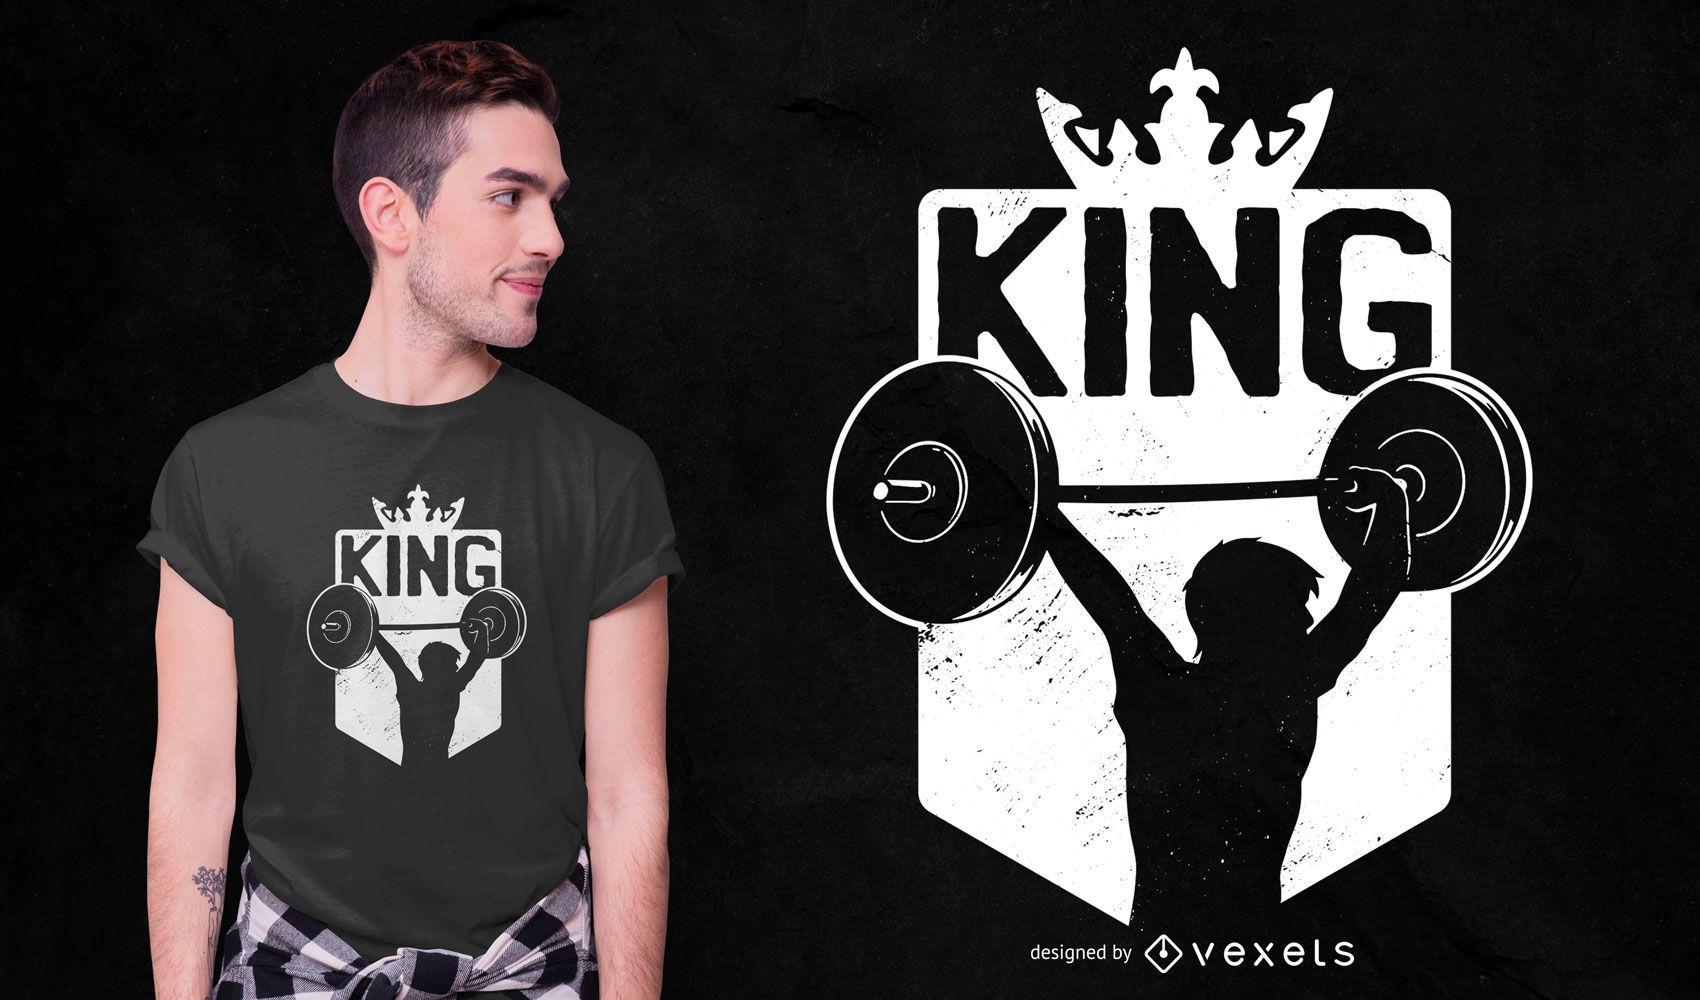 Weightlifting king t-shirt design